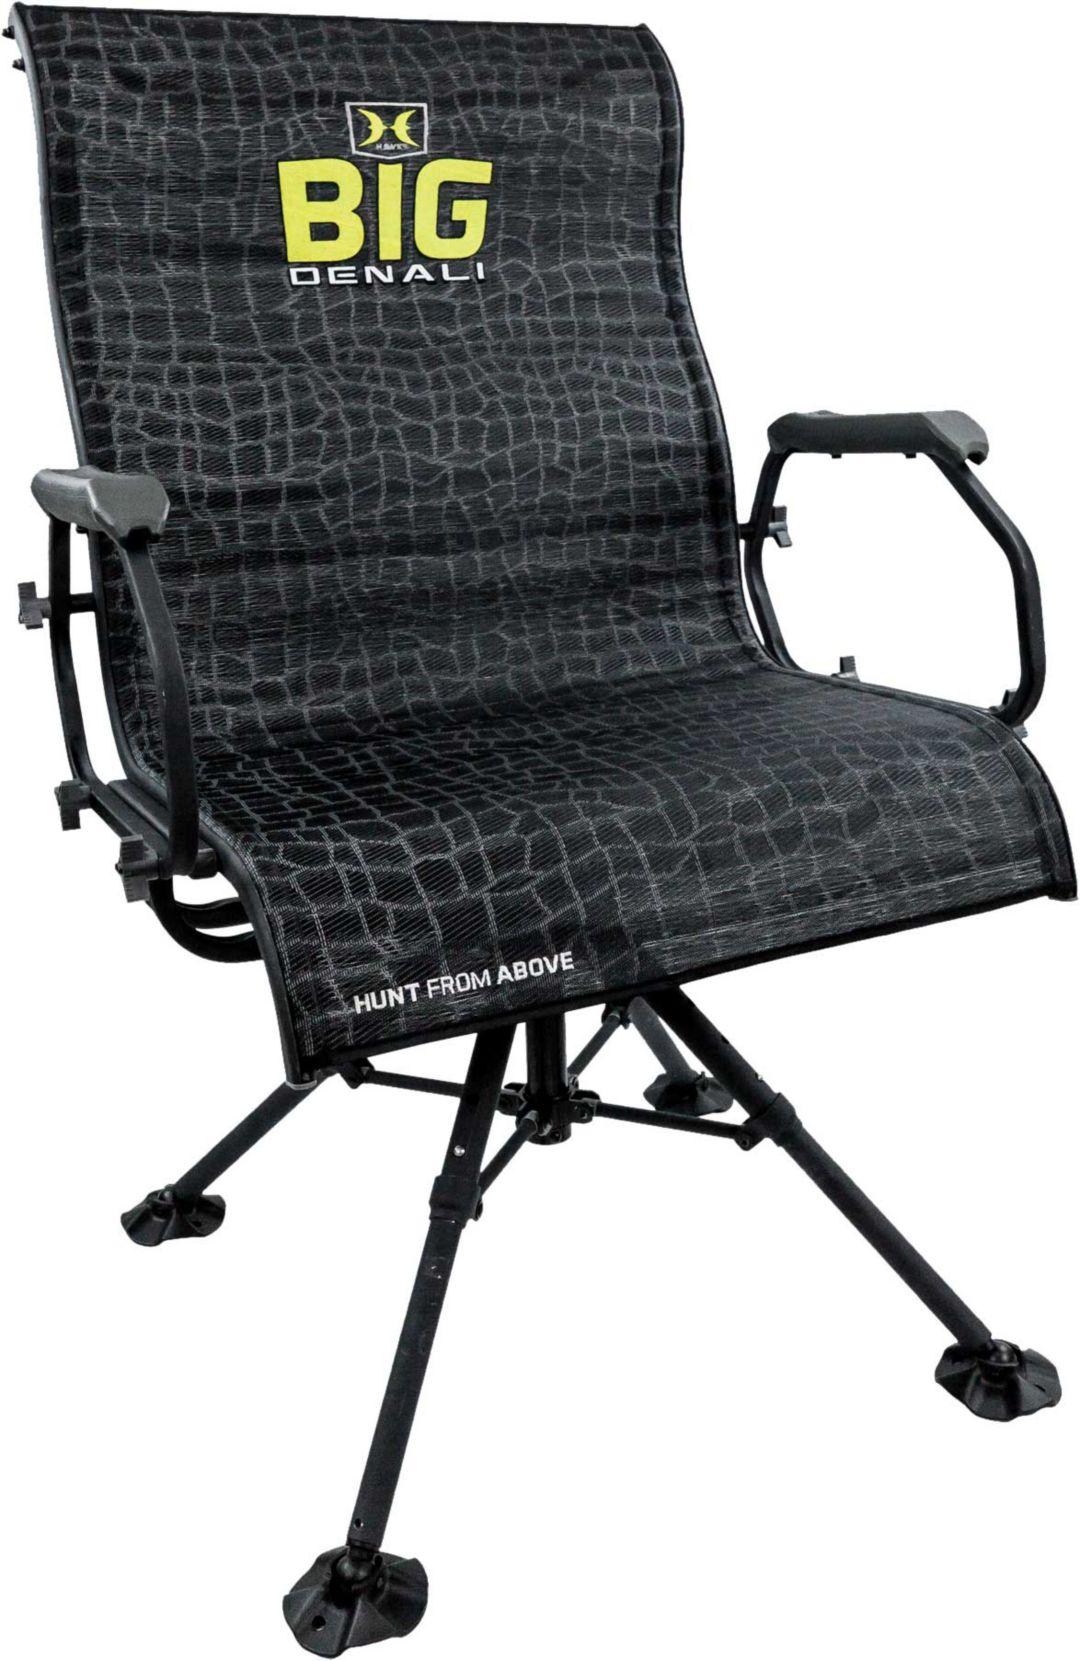 Awesome Hawk Hunting Big Denali Blind Chair Inzonedesignstudio Interior Chair Design Inzonedesignstudiocom